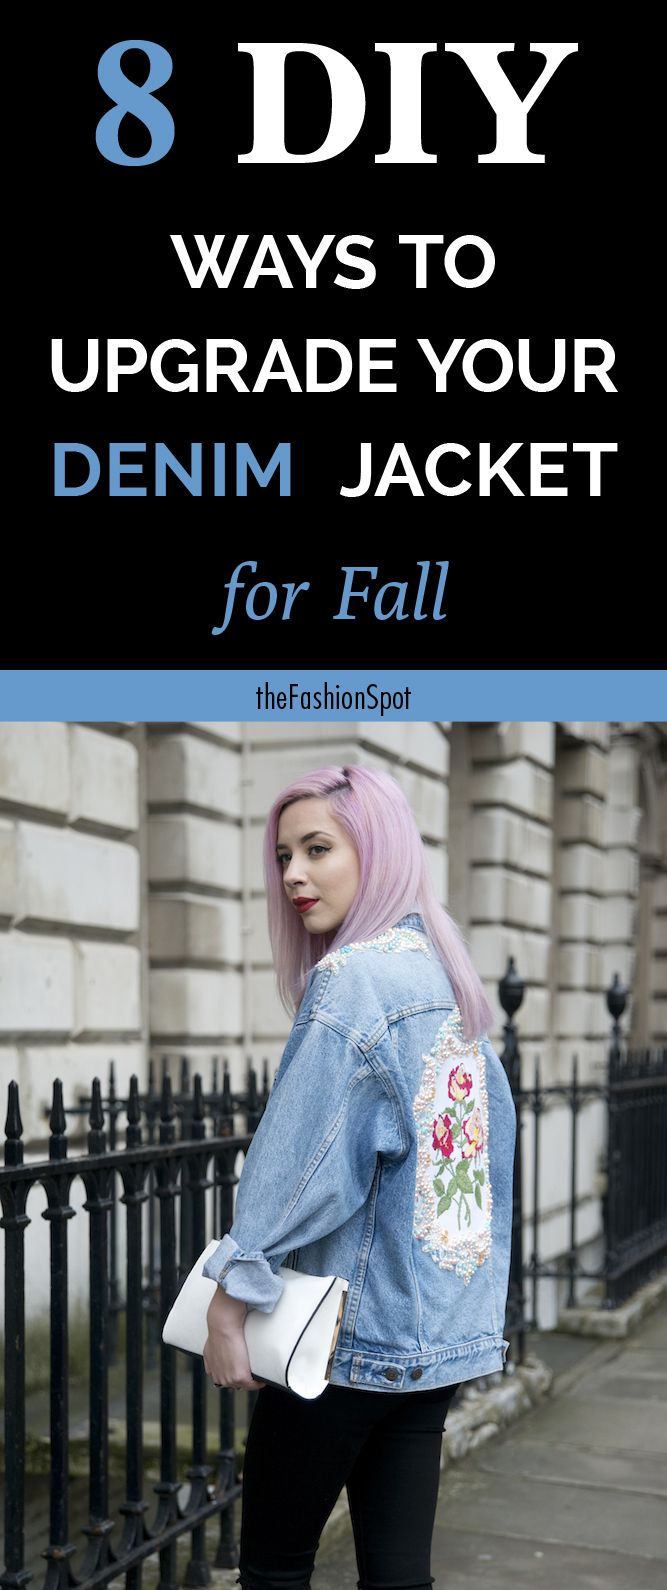 DIY your denim jacket